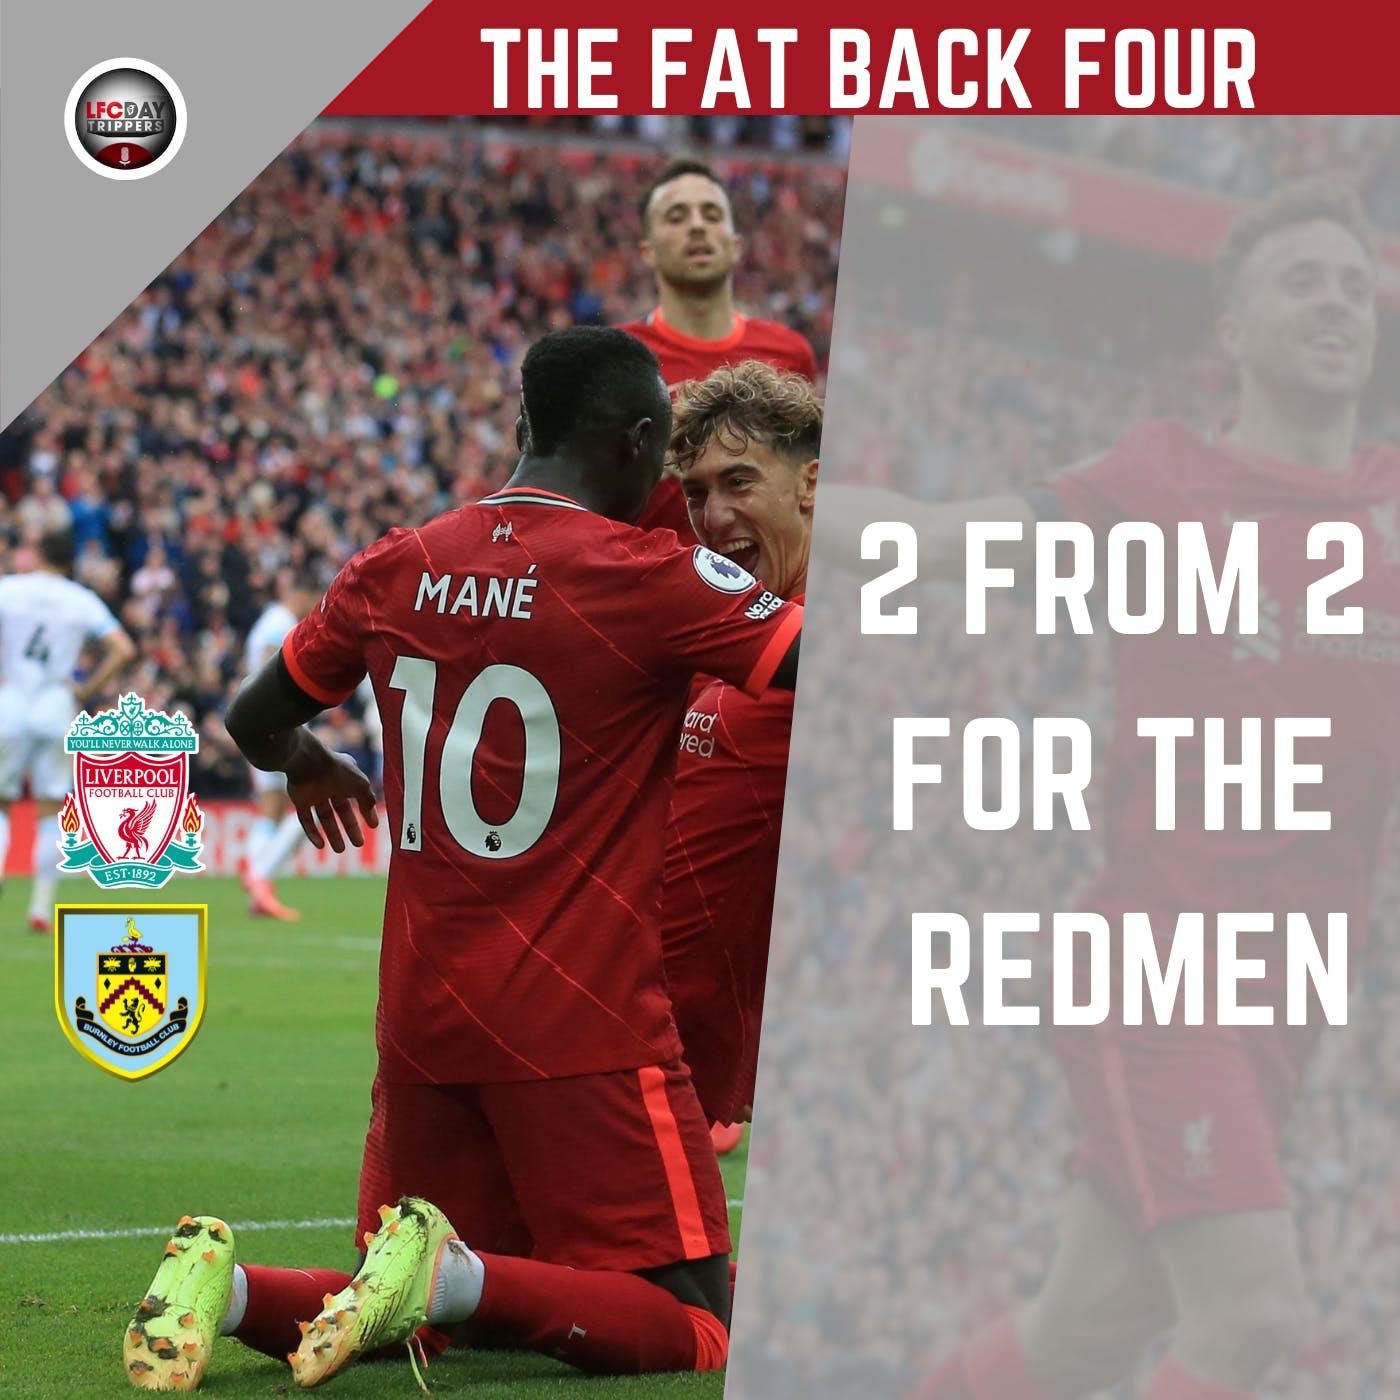 Harvey Elliott has arrived  | Liverpool 2 Burnley 0 | FB4